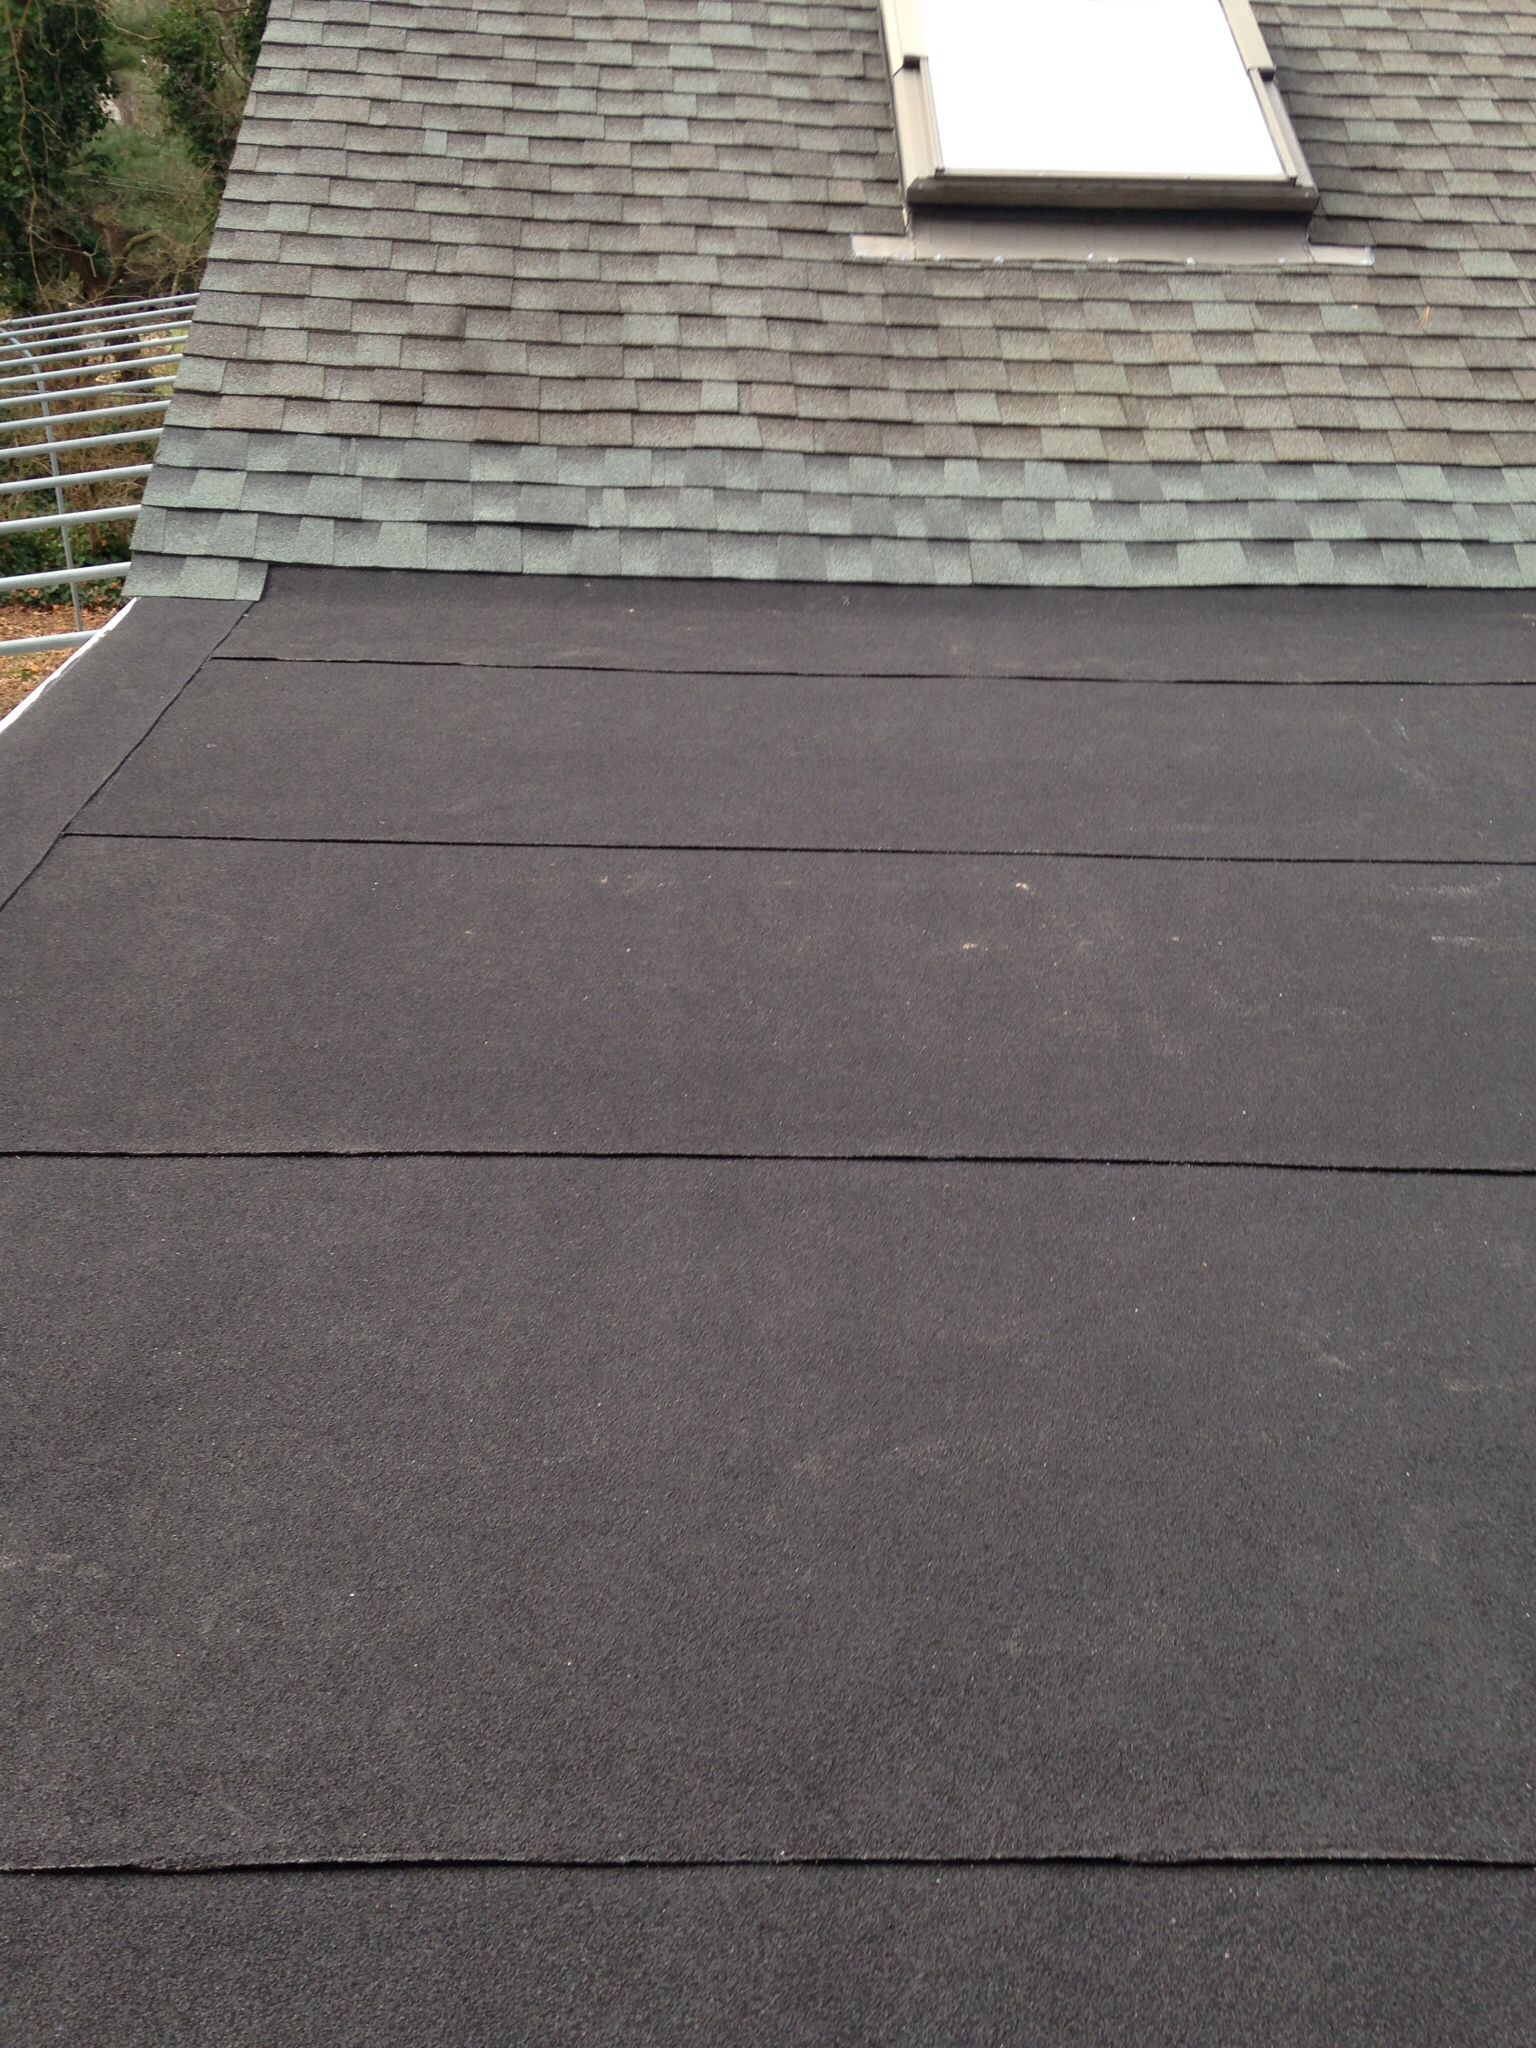 Long Island Flat Roofing Www Liroofrepair Com Commercialroofrepair Roof Repair Roof Leak Repair Roof Installation